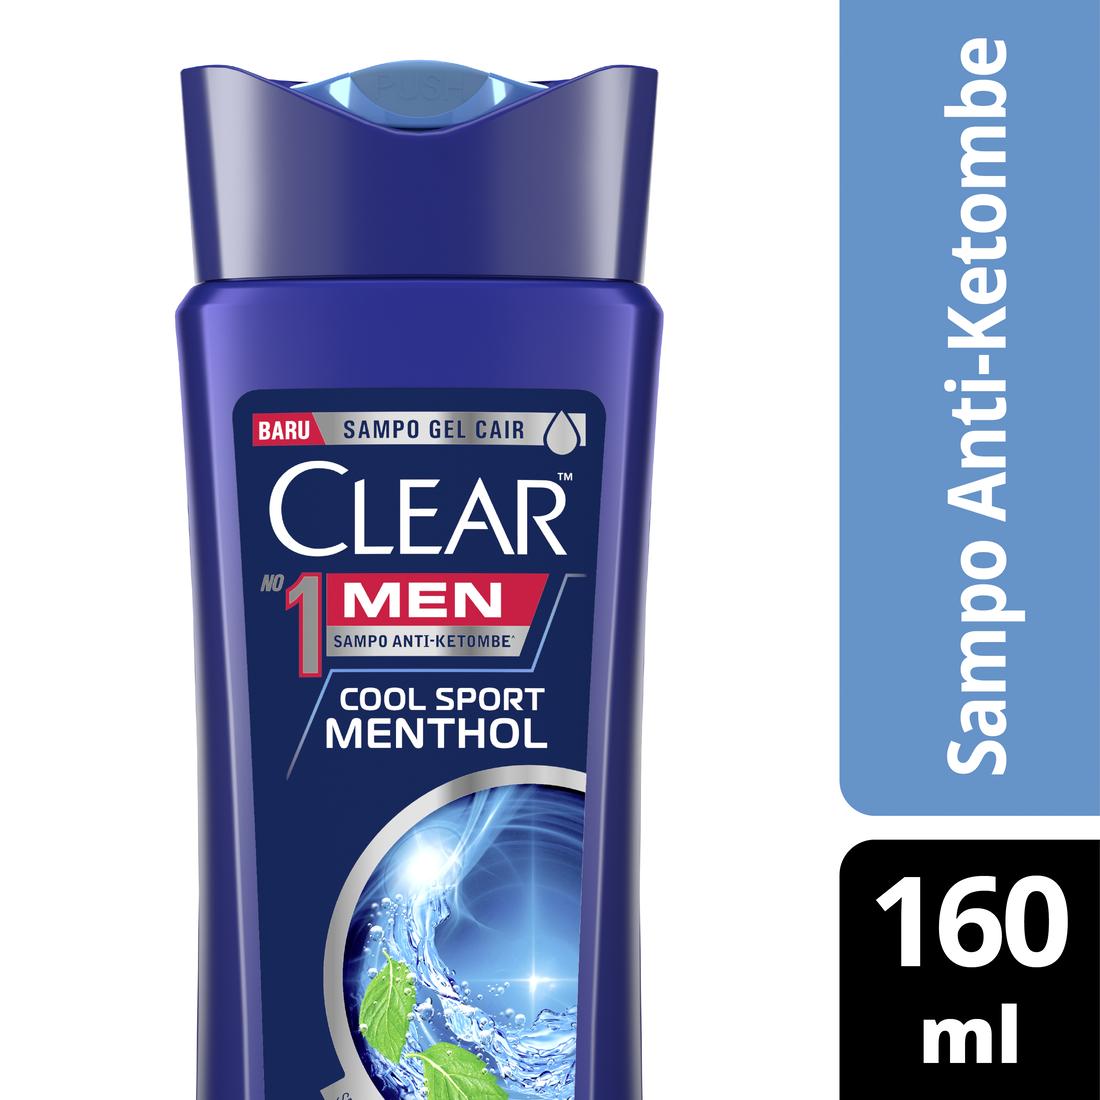 Buy Clear Shampoo Ice Cool Menthol 660 Ml Free Clear Men Cool Sport Menthol 160ml-2